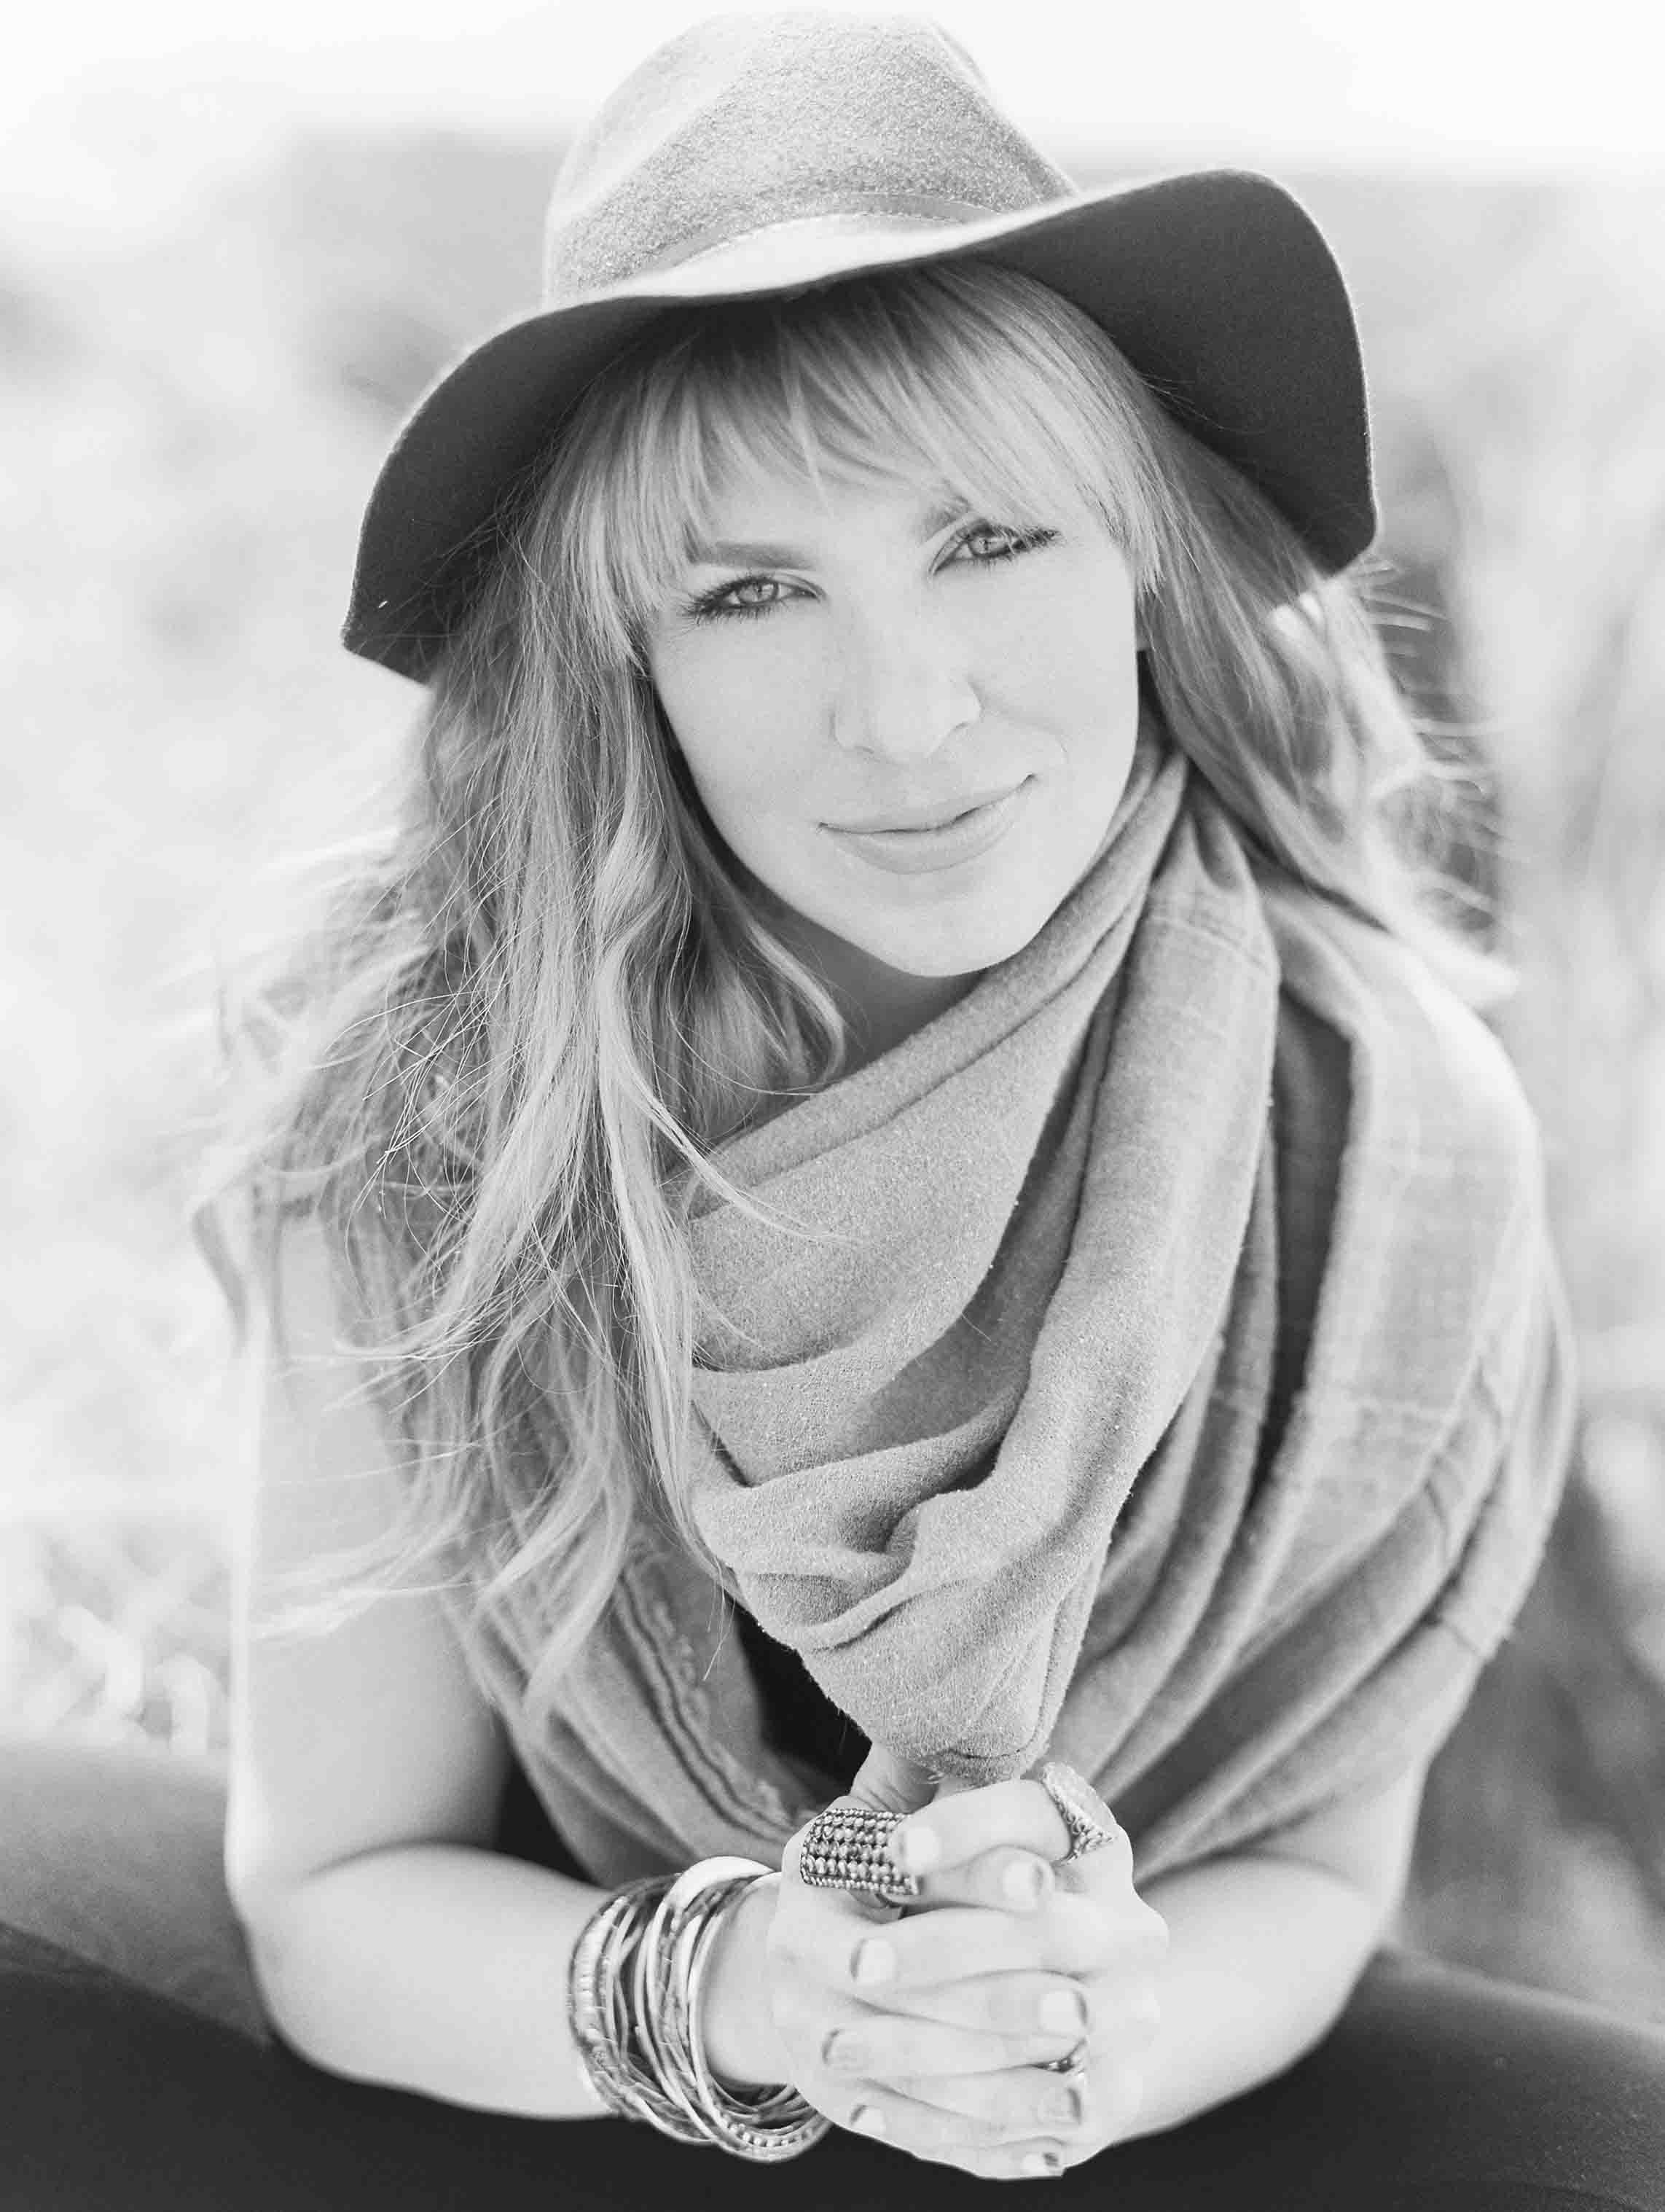 Janie-Rocek-headshot-by-Lisa-O'Dwyer-10.jpg